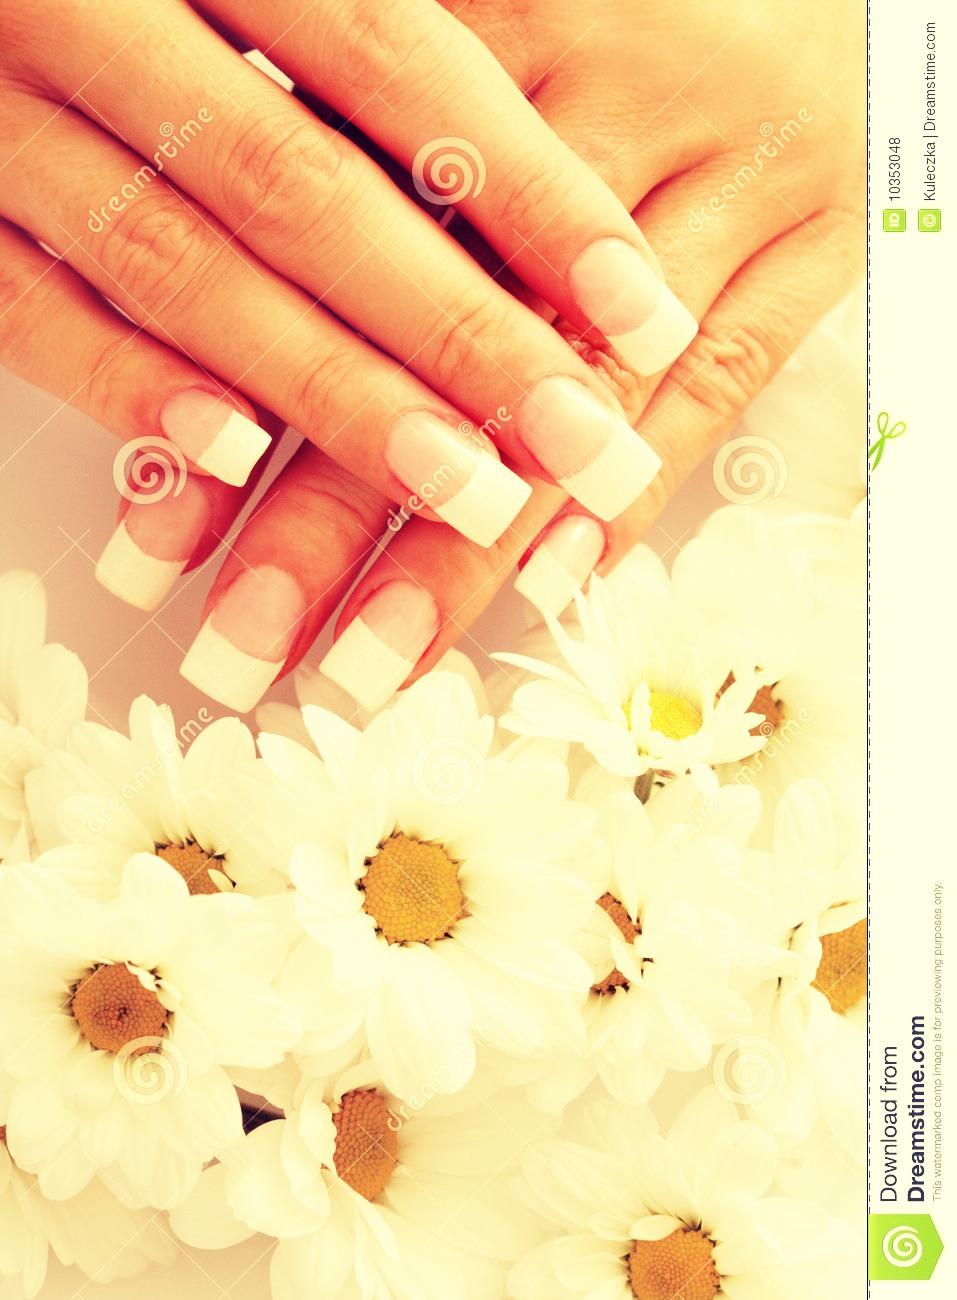 Фото свадебного маникюра шеллаком фото